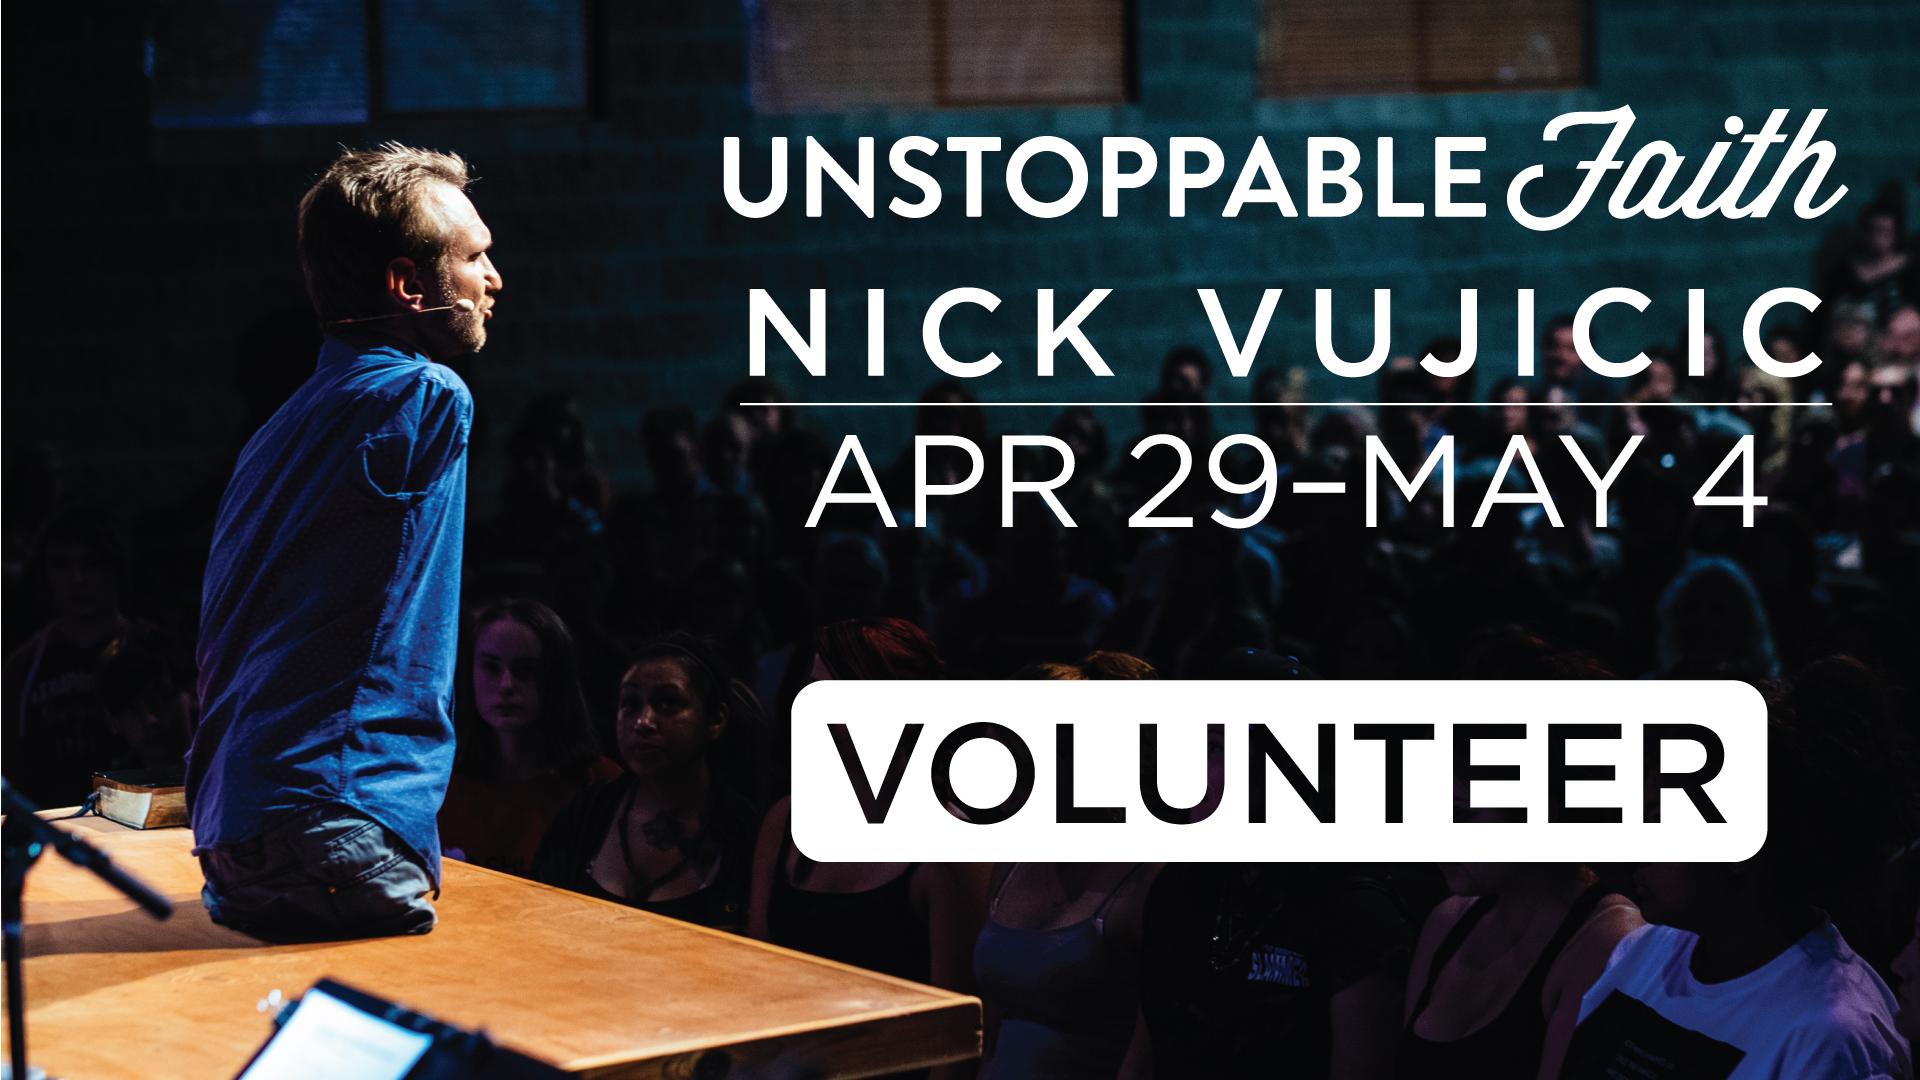 Unstoppable-Faith_Volunteers_Website.jpg